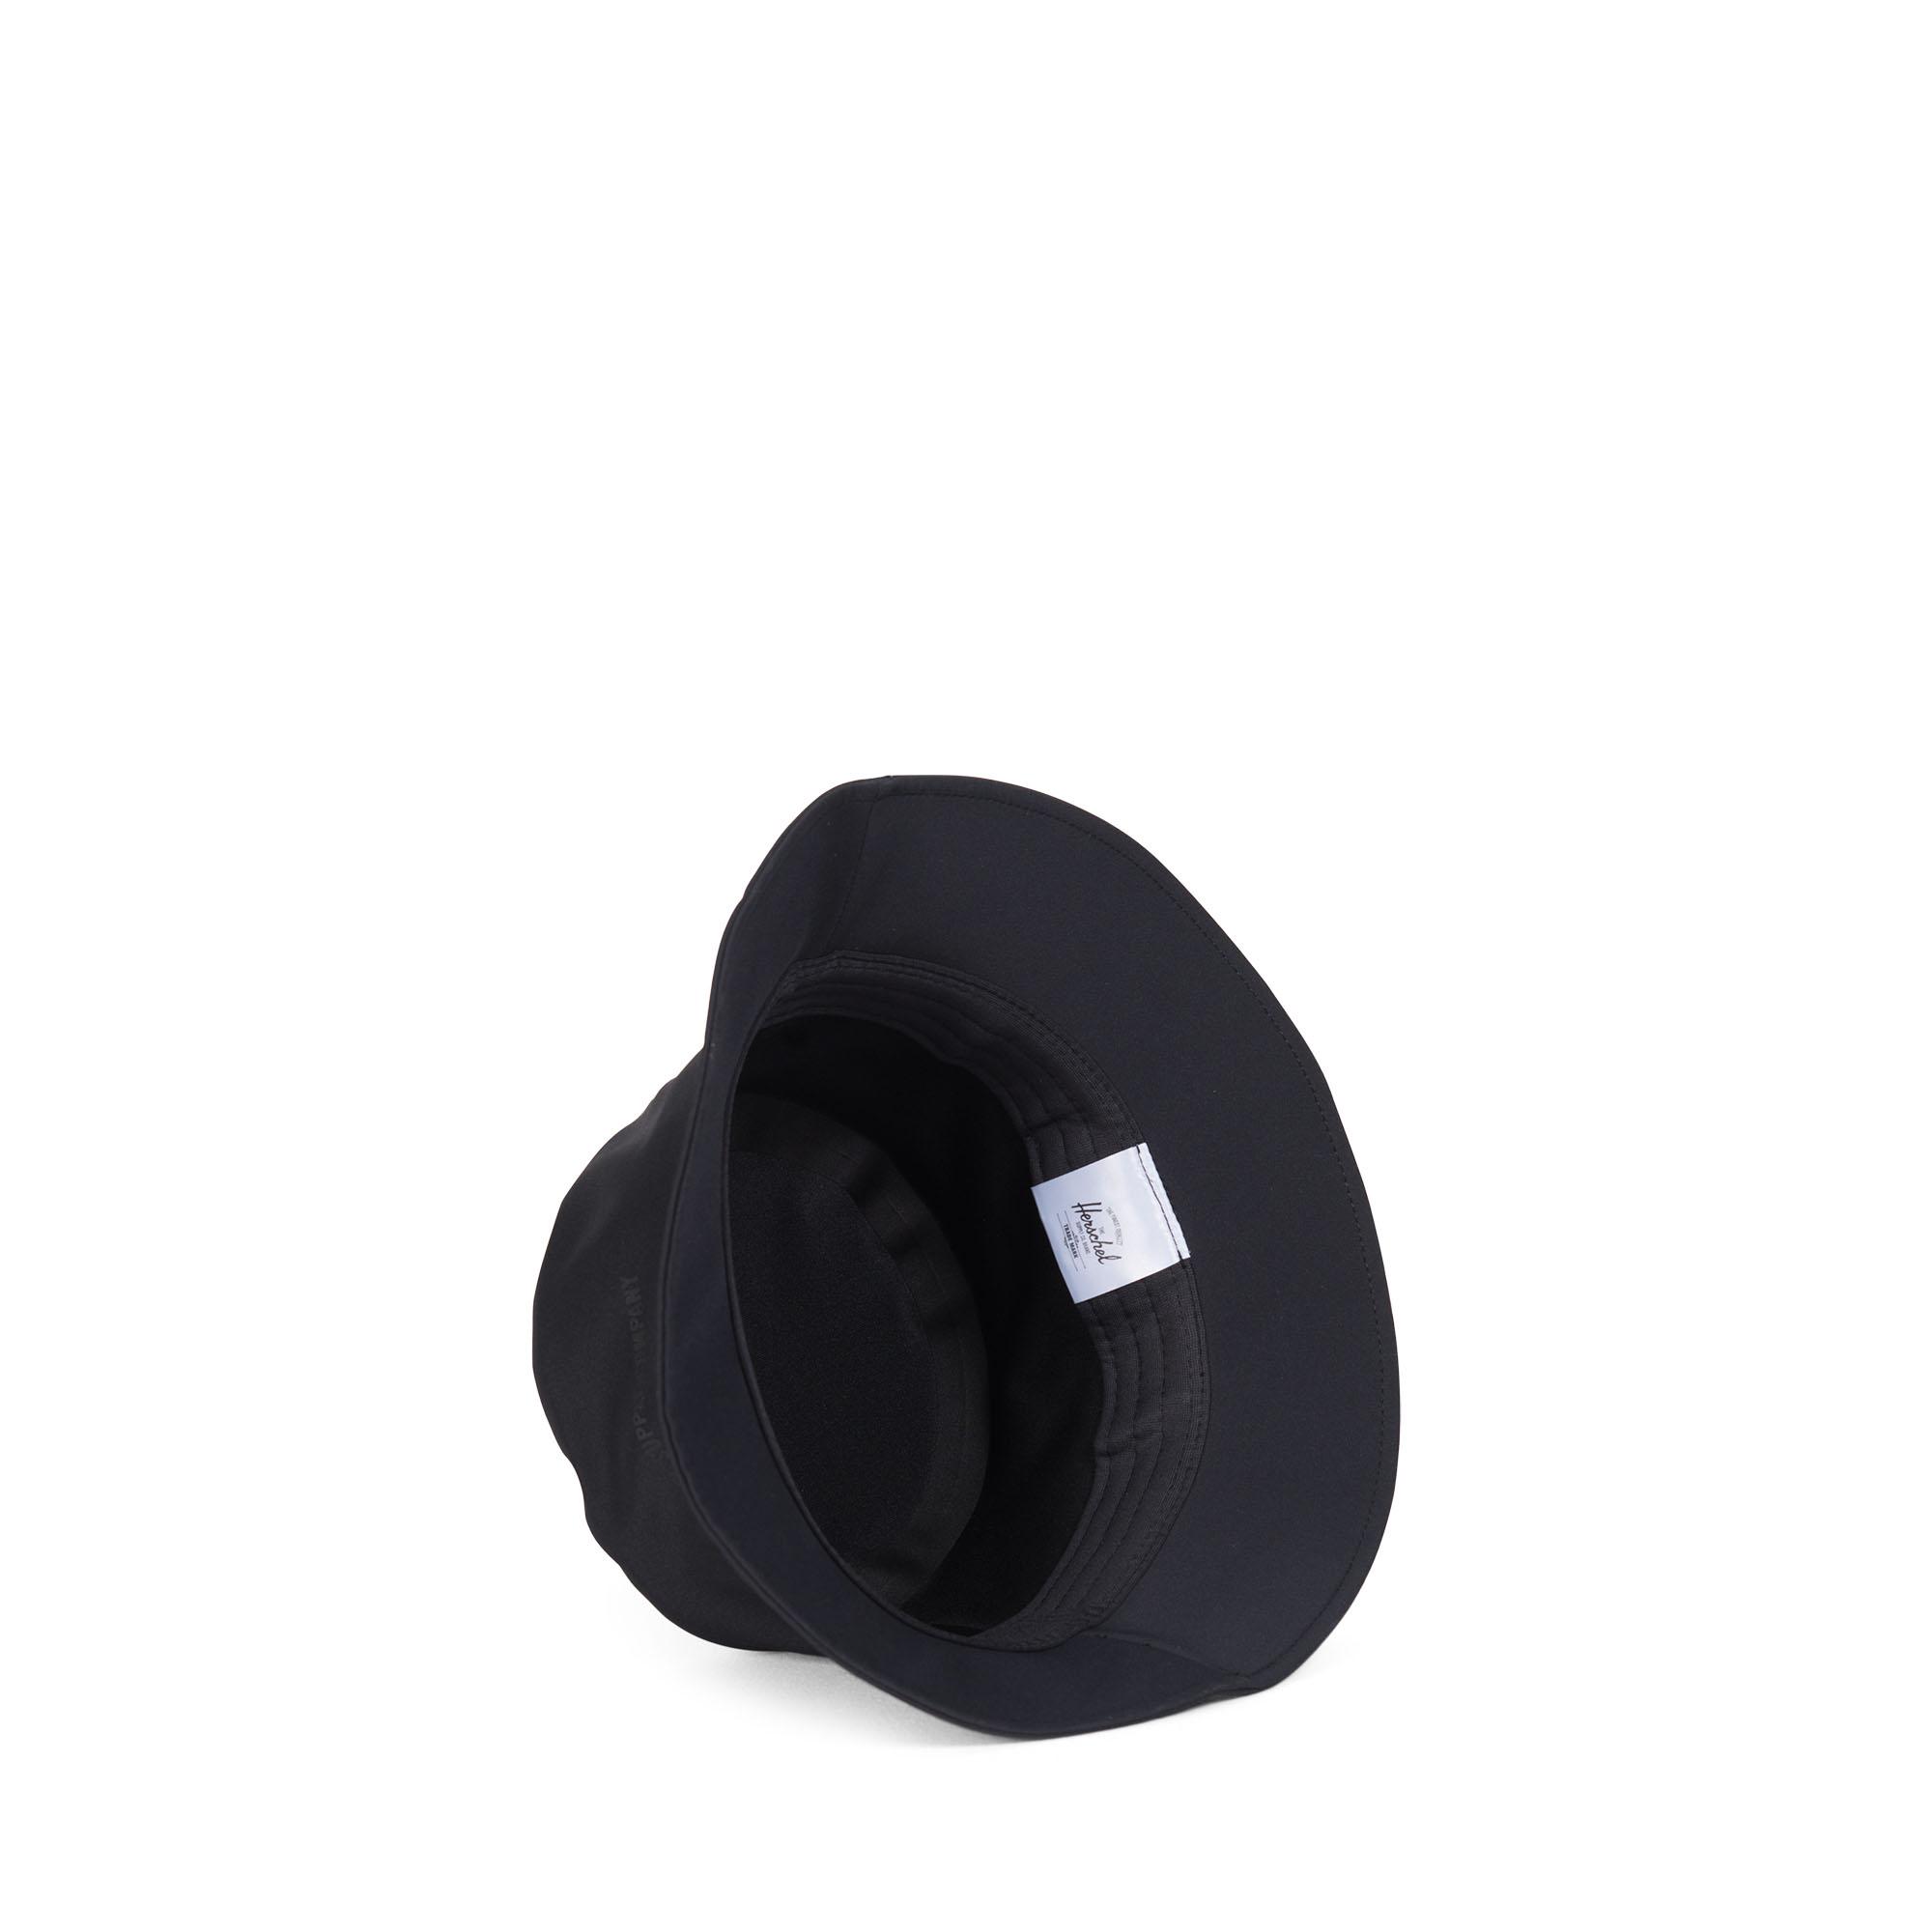 c80c5599e0a46 Lake Bucket Hat